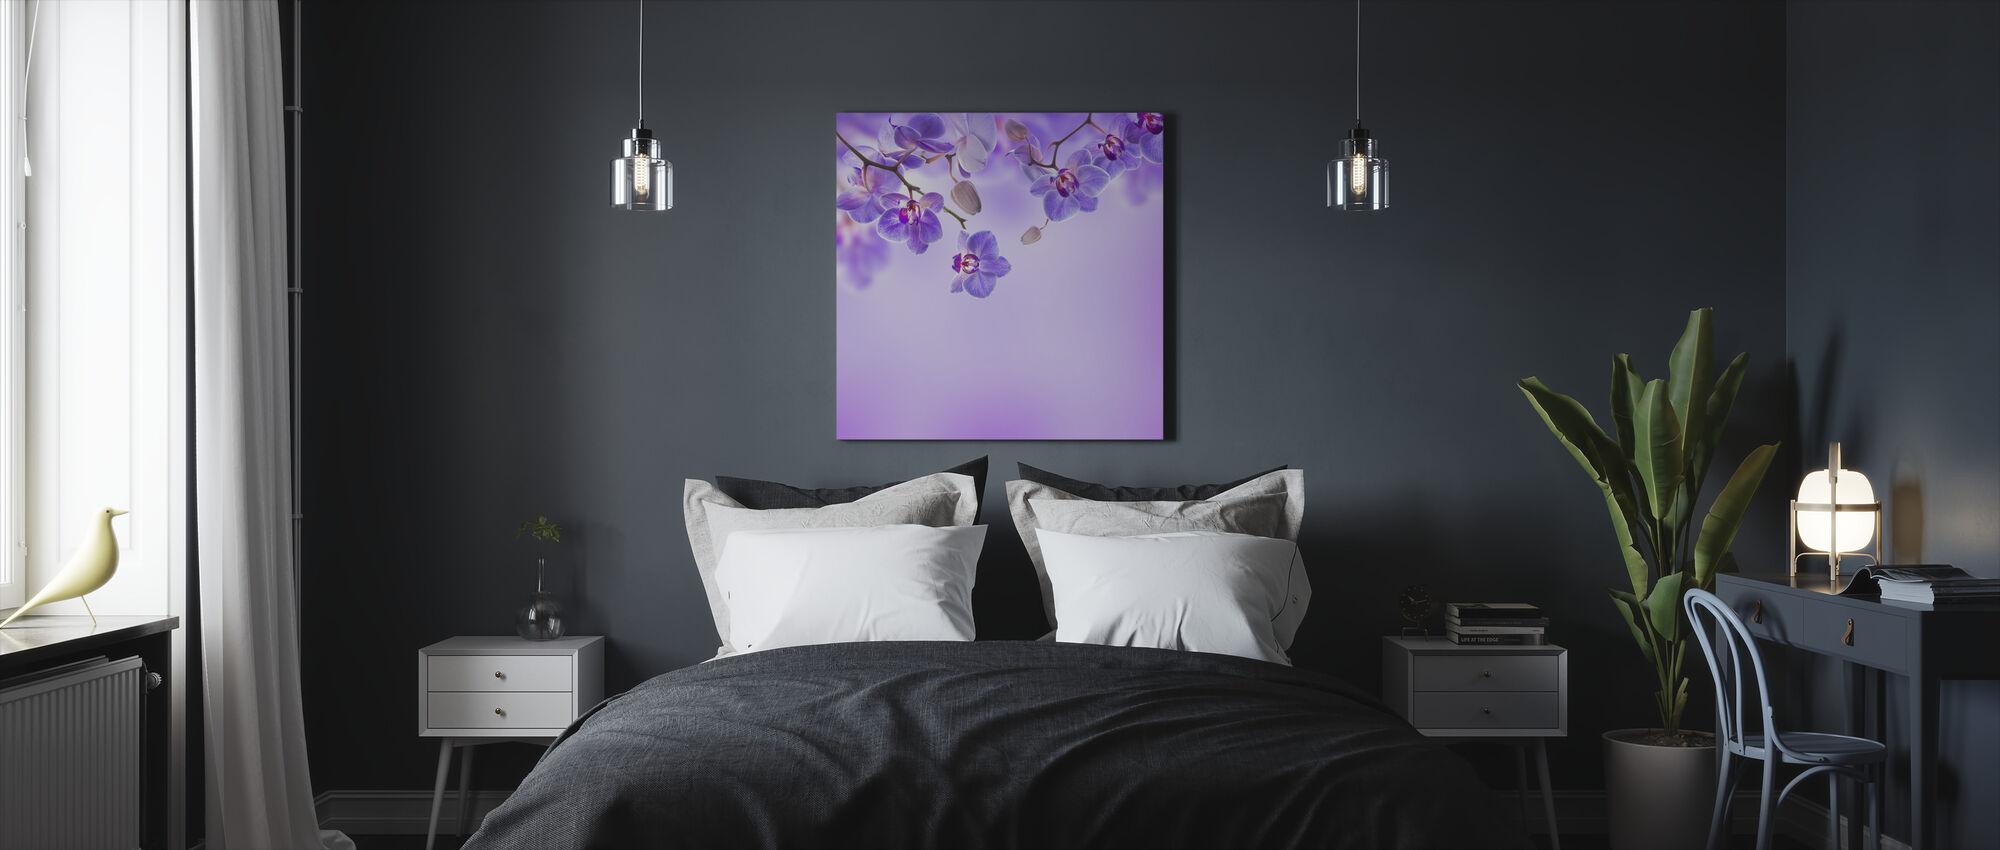 Pehmeä violetti orkideat - Canvastaulu - Makuuhuone